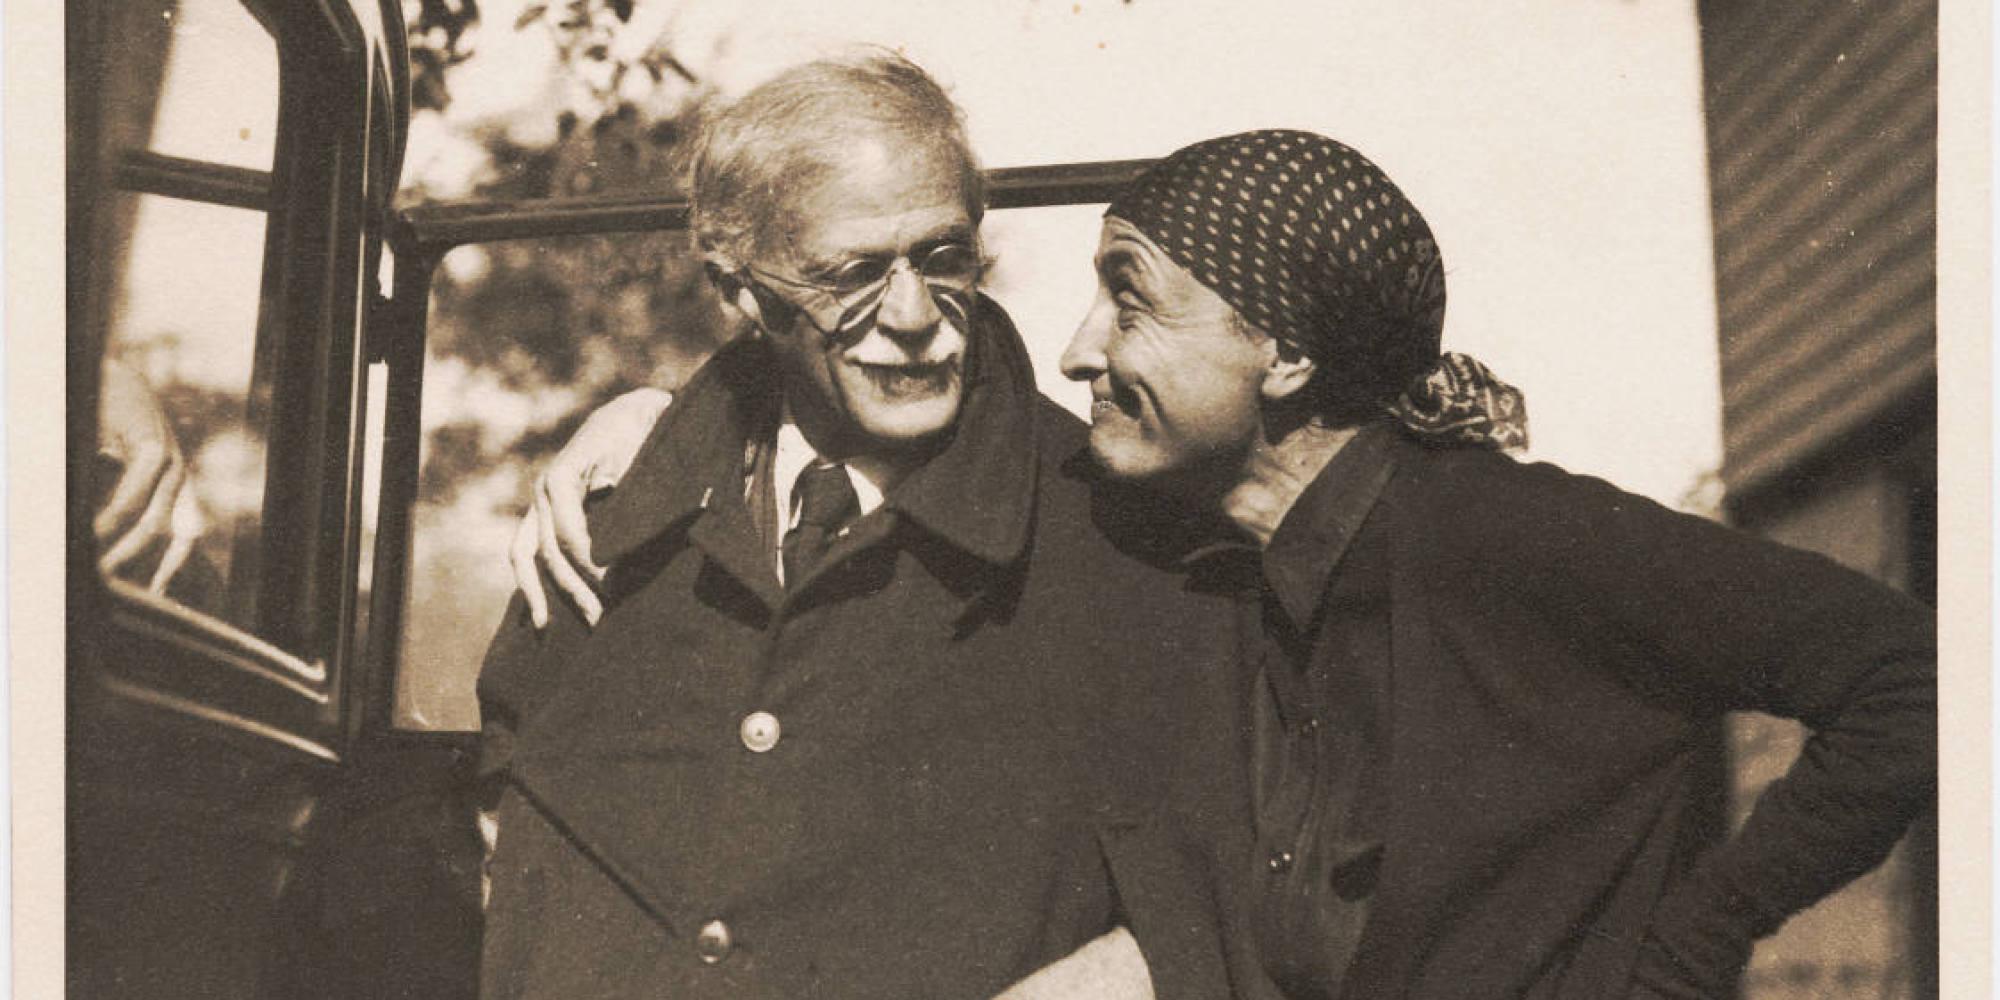 Alfred Stieglitz and Georgia O'Keefe